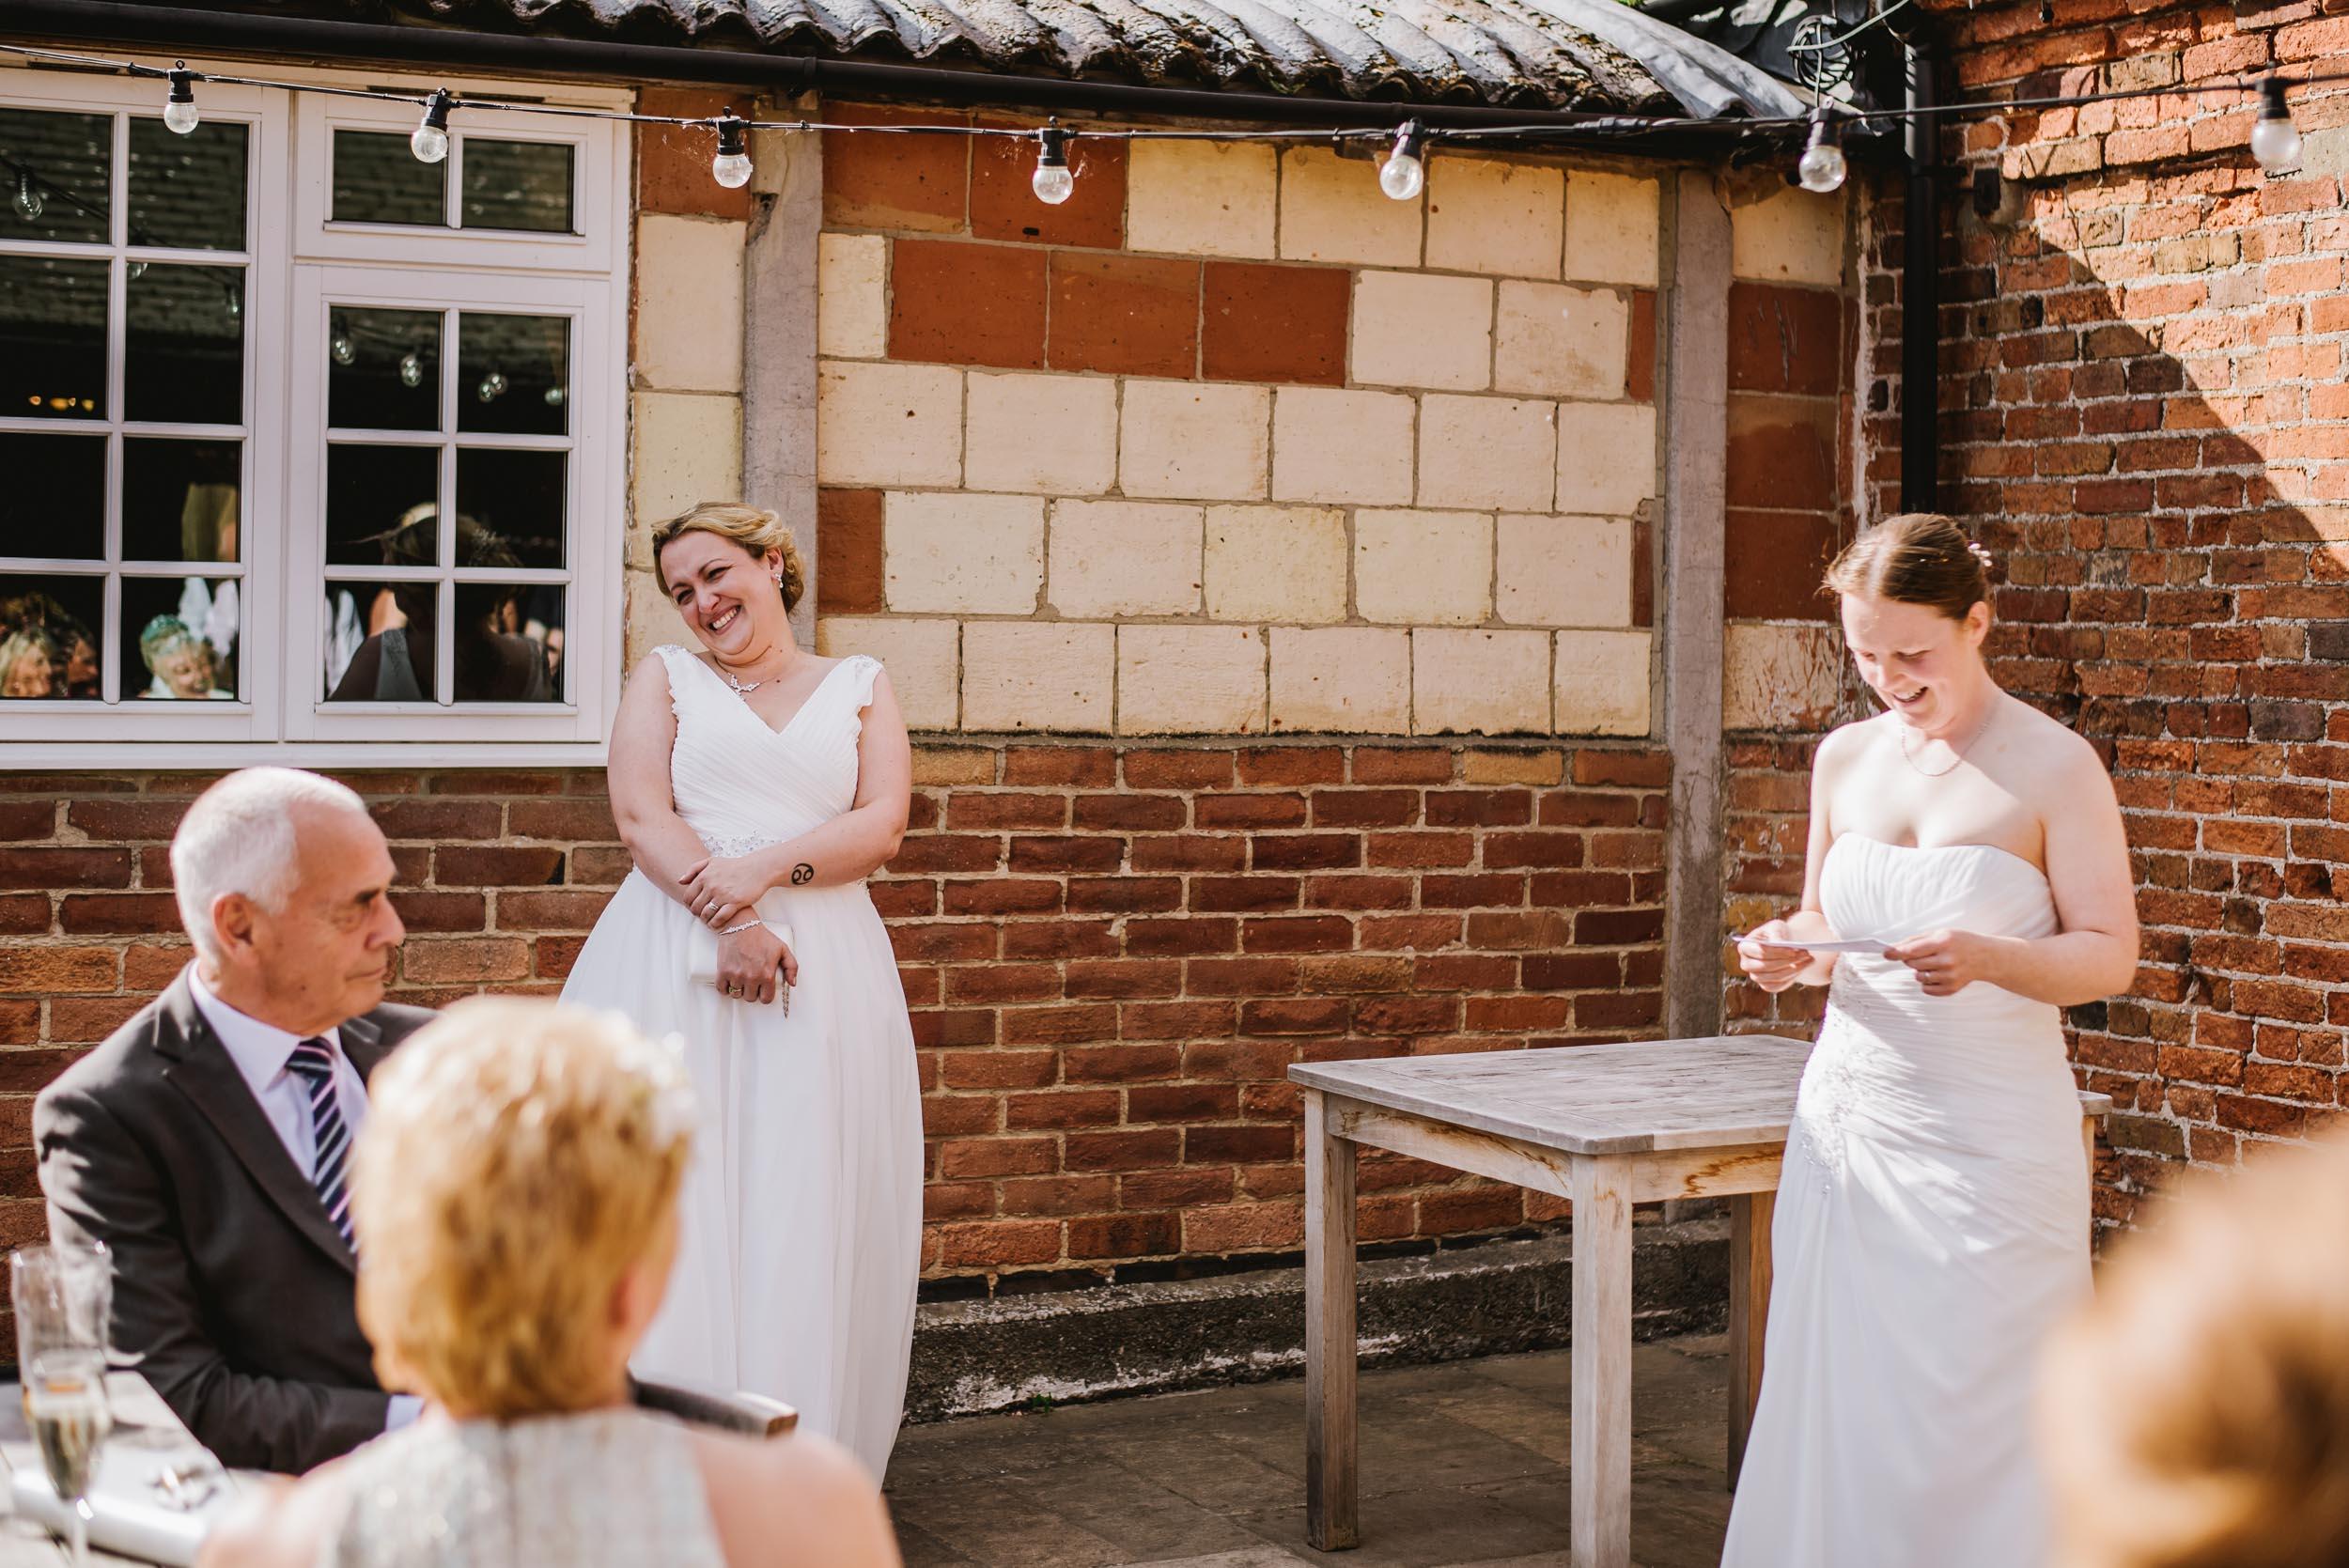 Donington-park-farm-wedding-photography-421.jpg